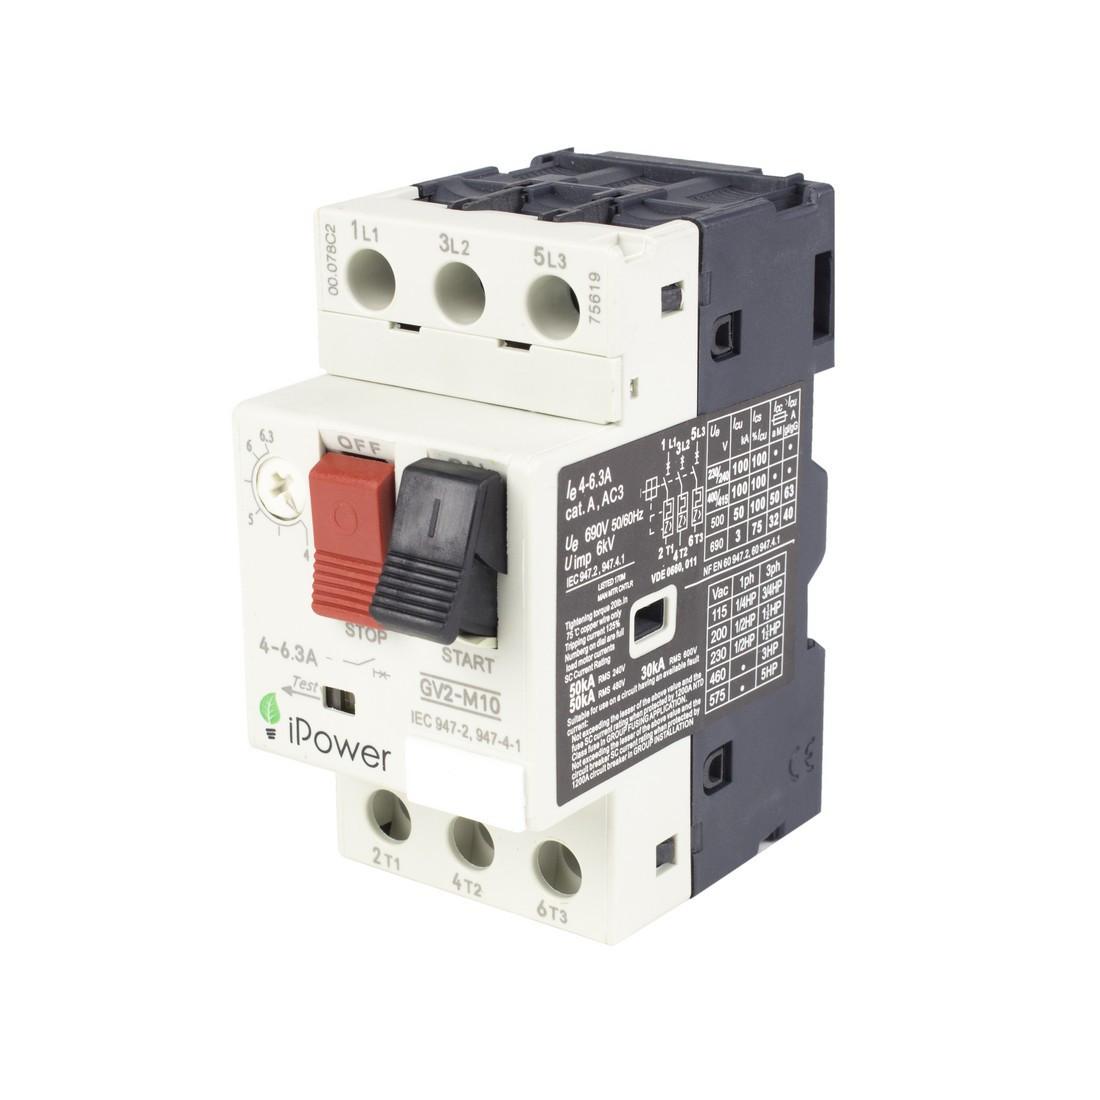 Автомат защиты двигателя iPower GV2-M21 (17-23A)